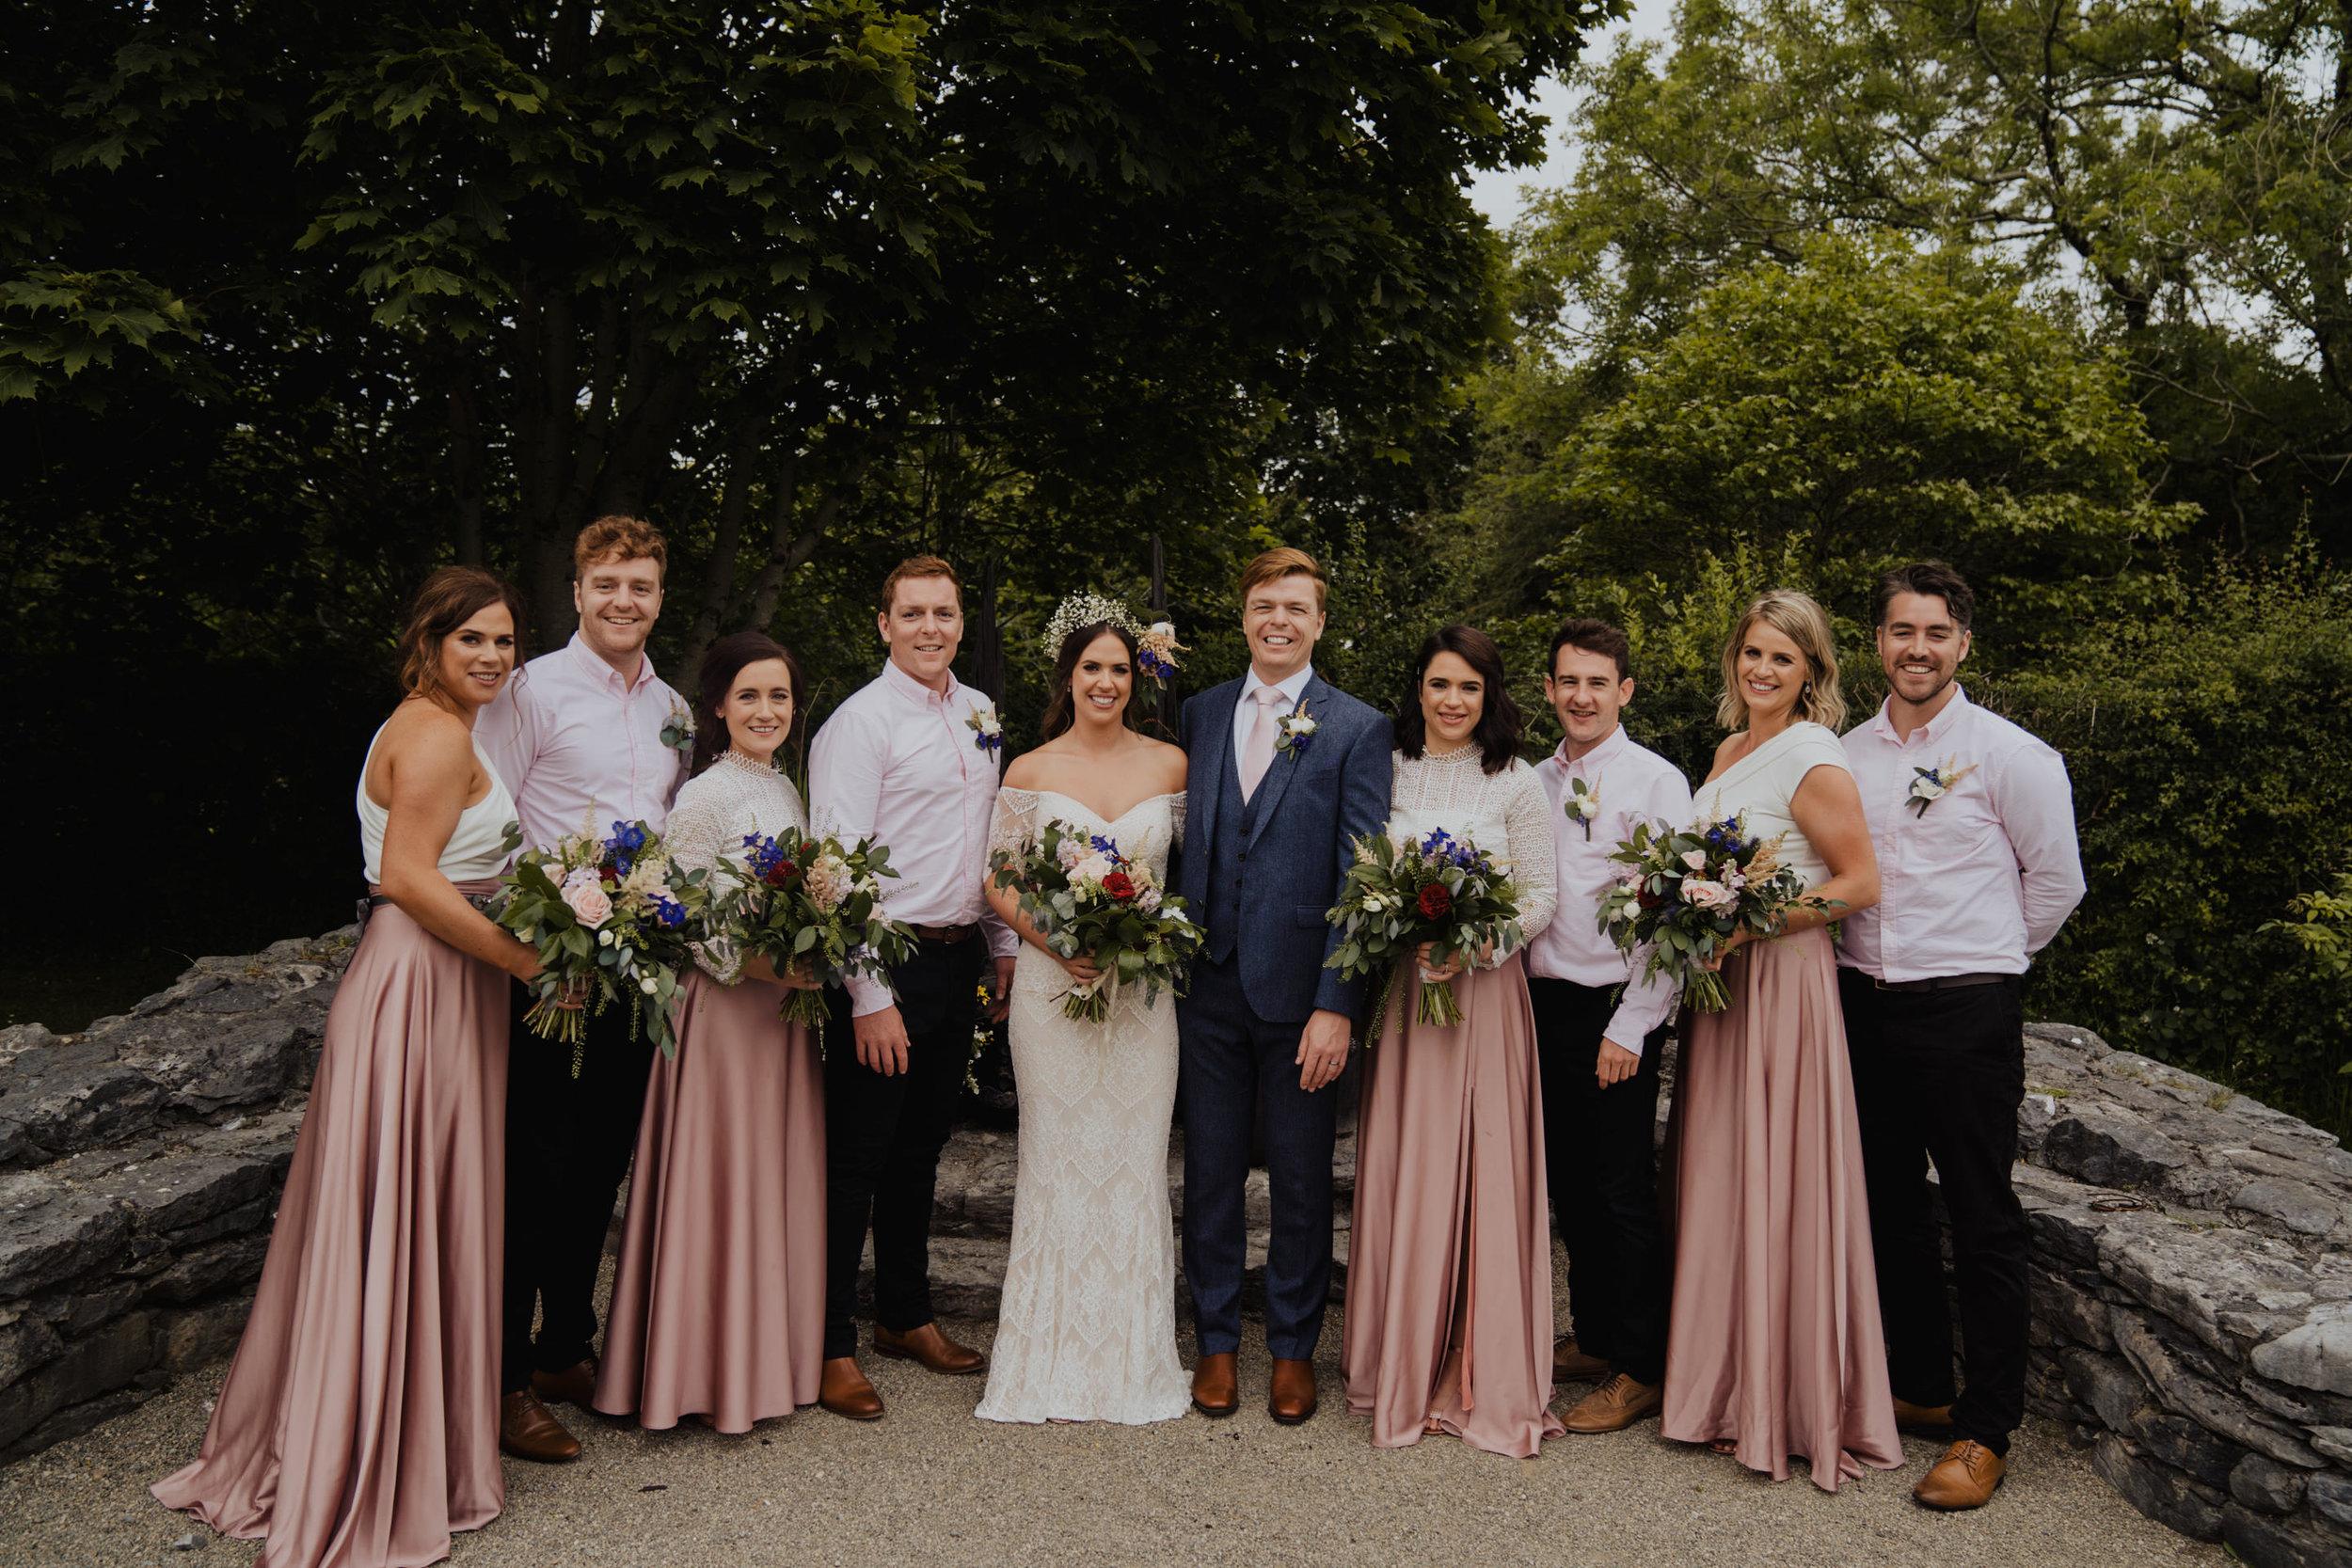 c&j_brigits_garden_galway_wedding_photographer_livia_figueiredo_28.jpg